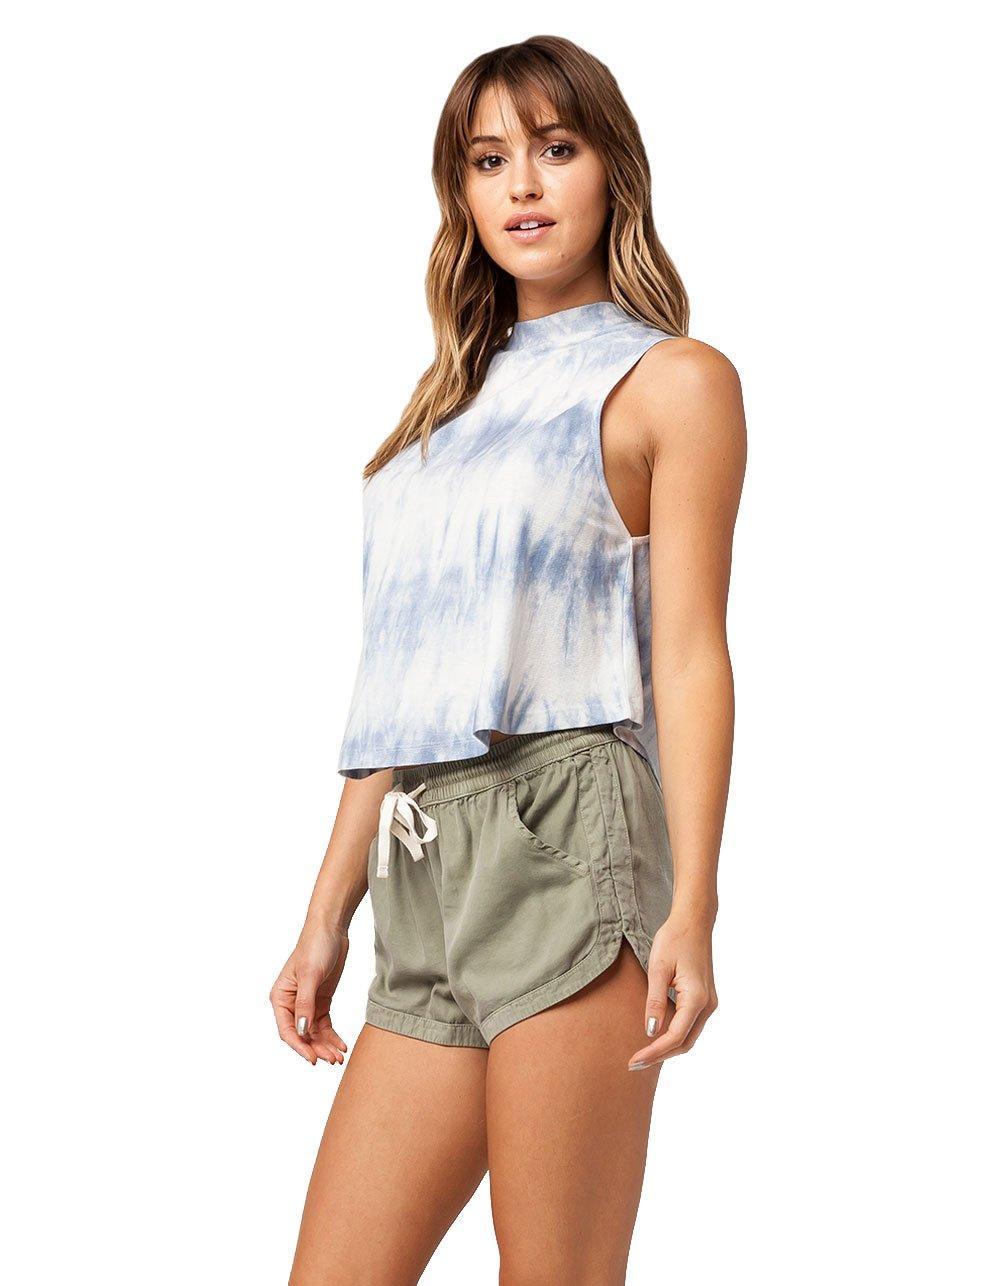 Billabong Women's Road Trippin Shorts, Sea Grass, L